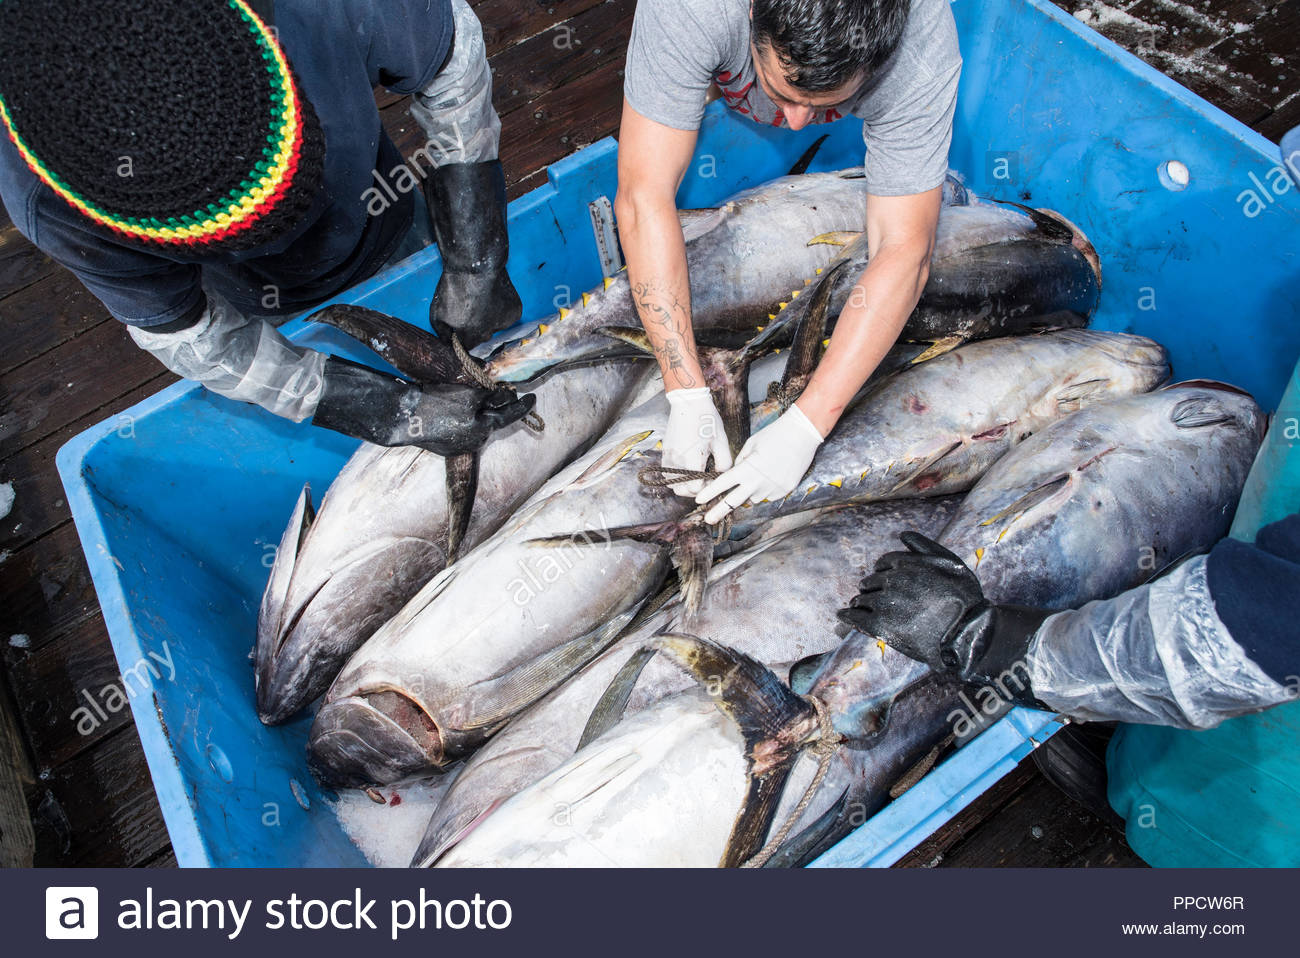 Deckhands organizing tuna in an ice bin on a dock in San Diego, California, USA - Stock Image